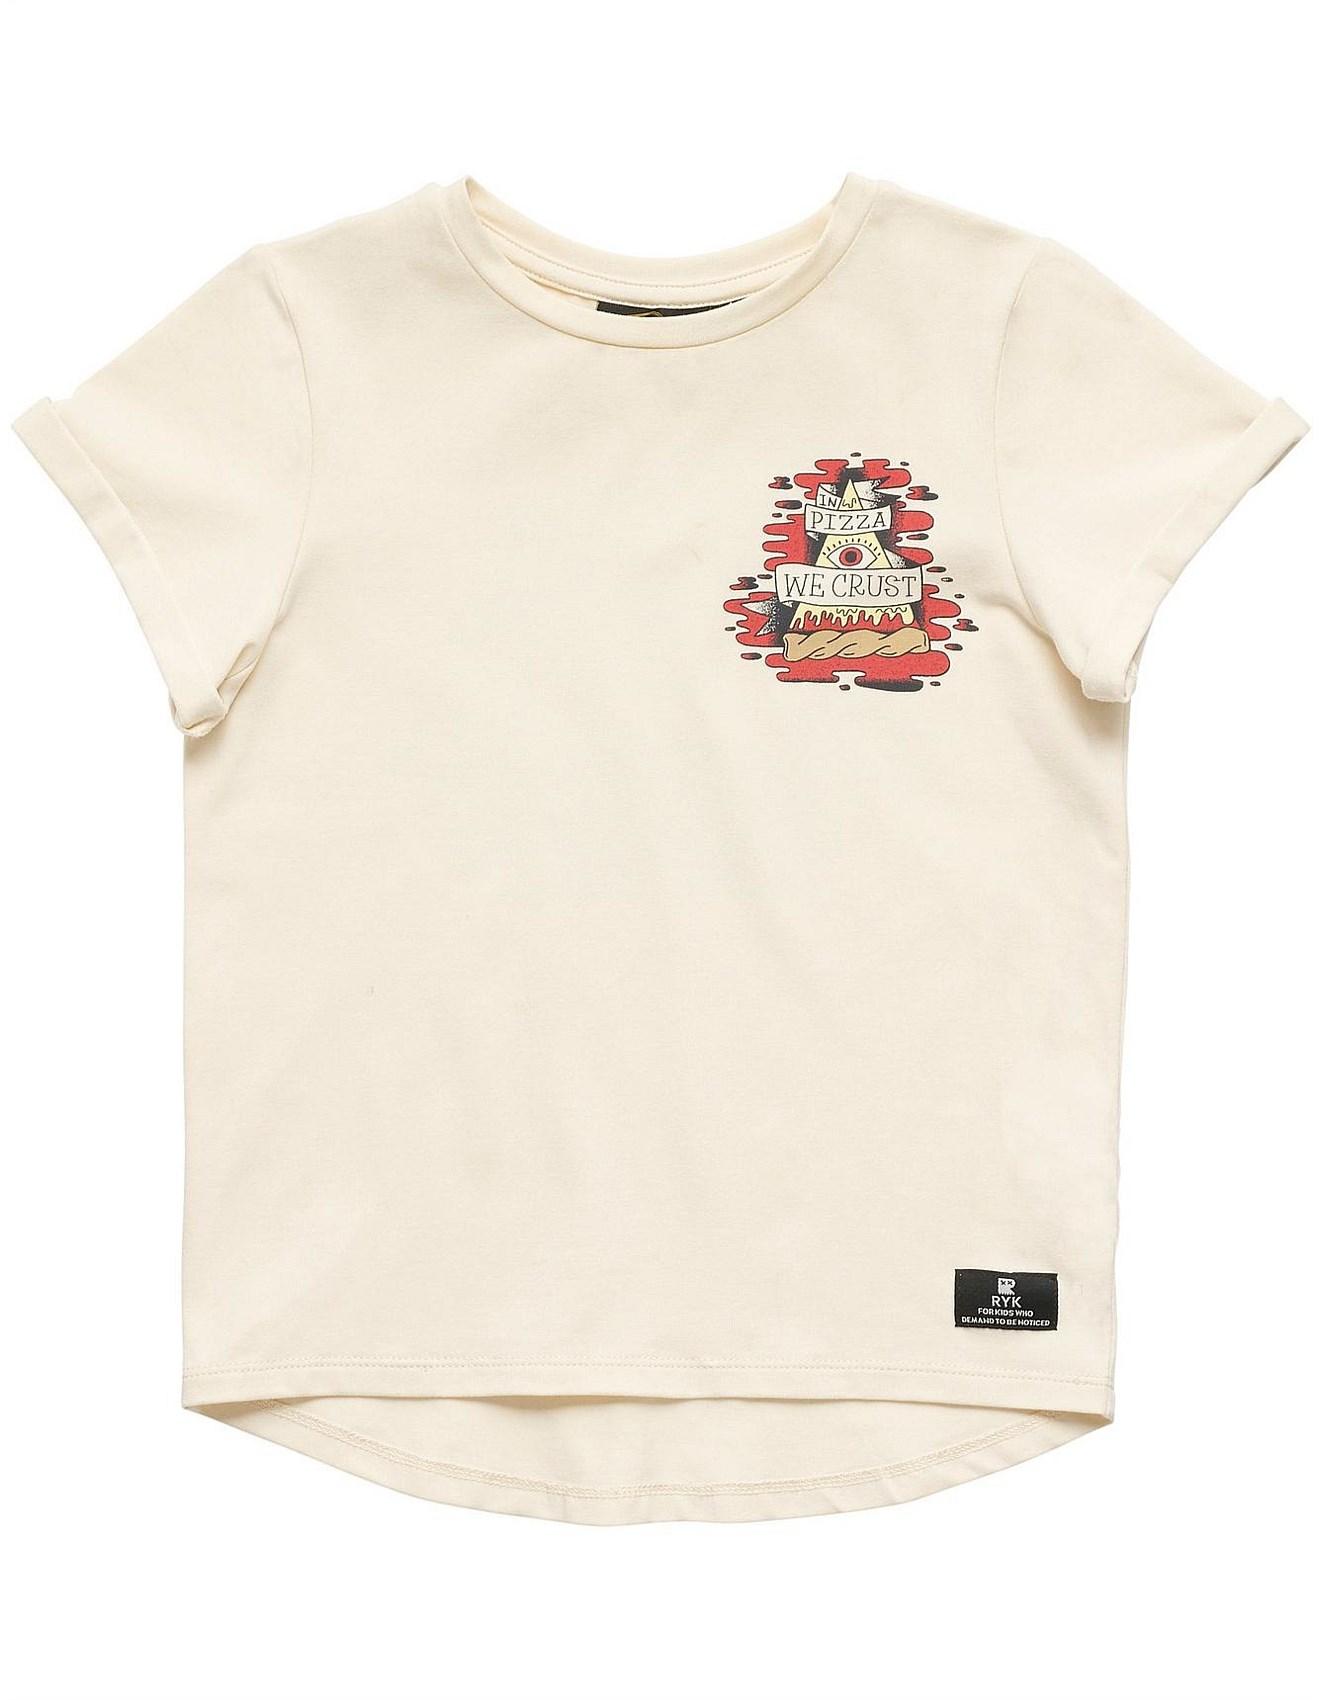 b4c1e2abd Rock Your Kid - In Pizza We Crust S/S T-Shirt (Boys 3-8 Years)